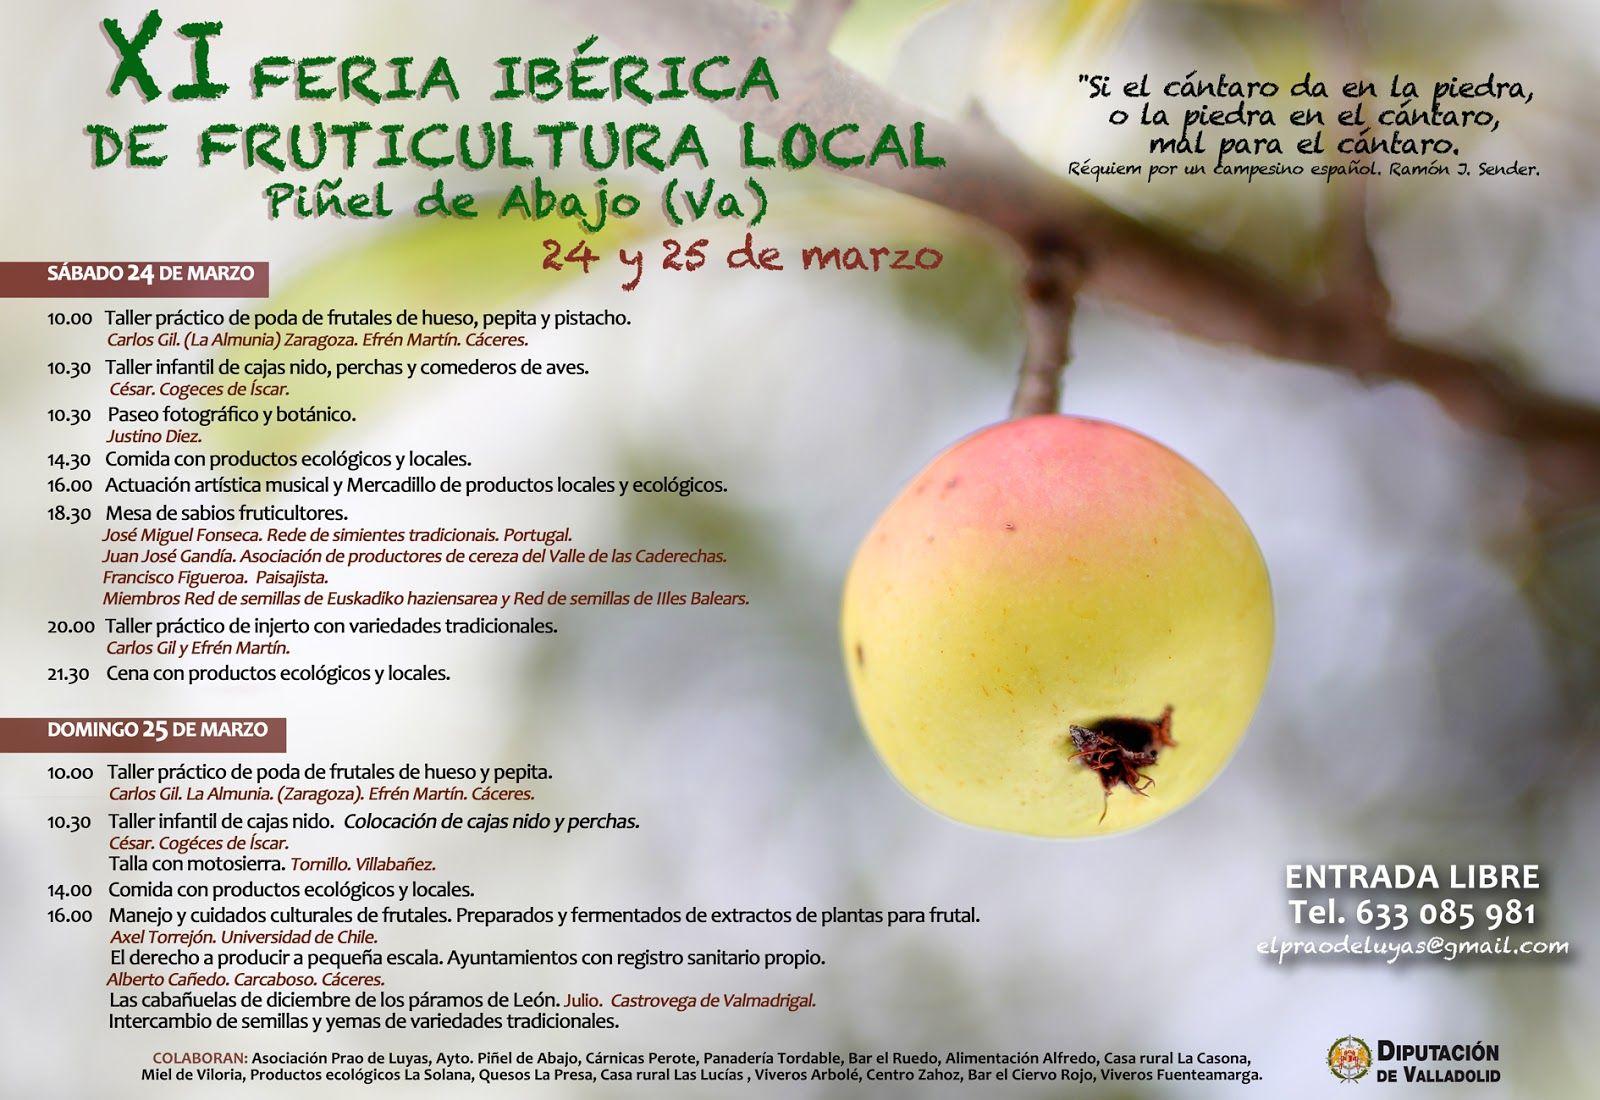 XI feria ibérica de fruticultura local